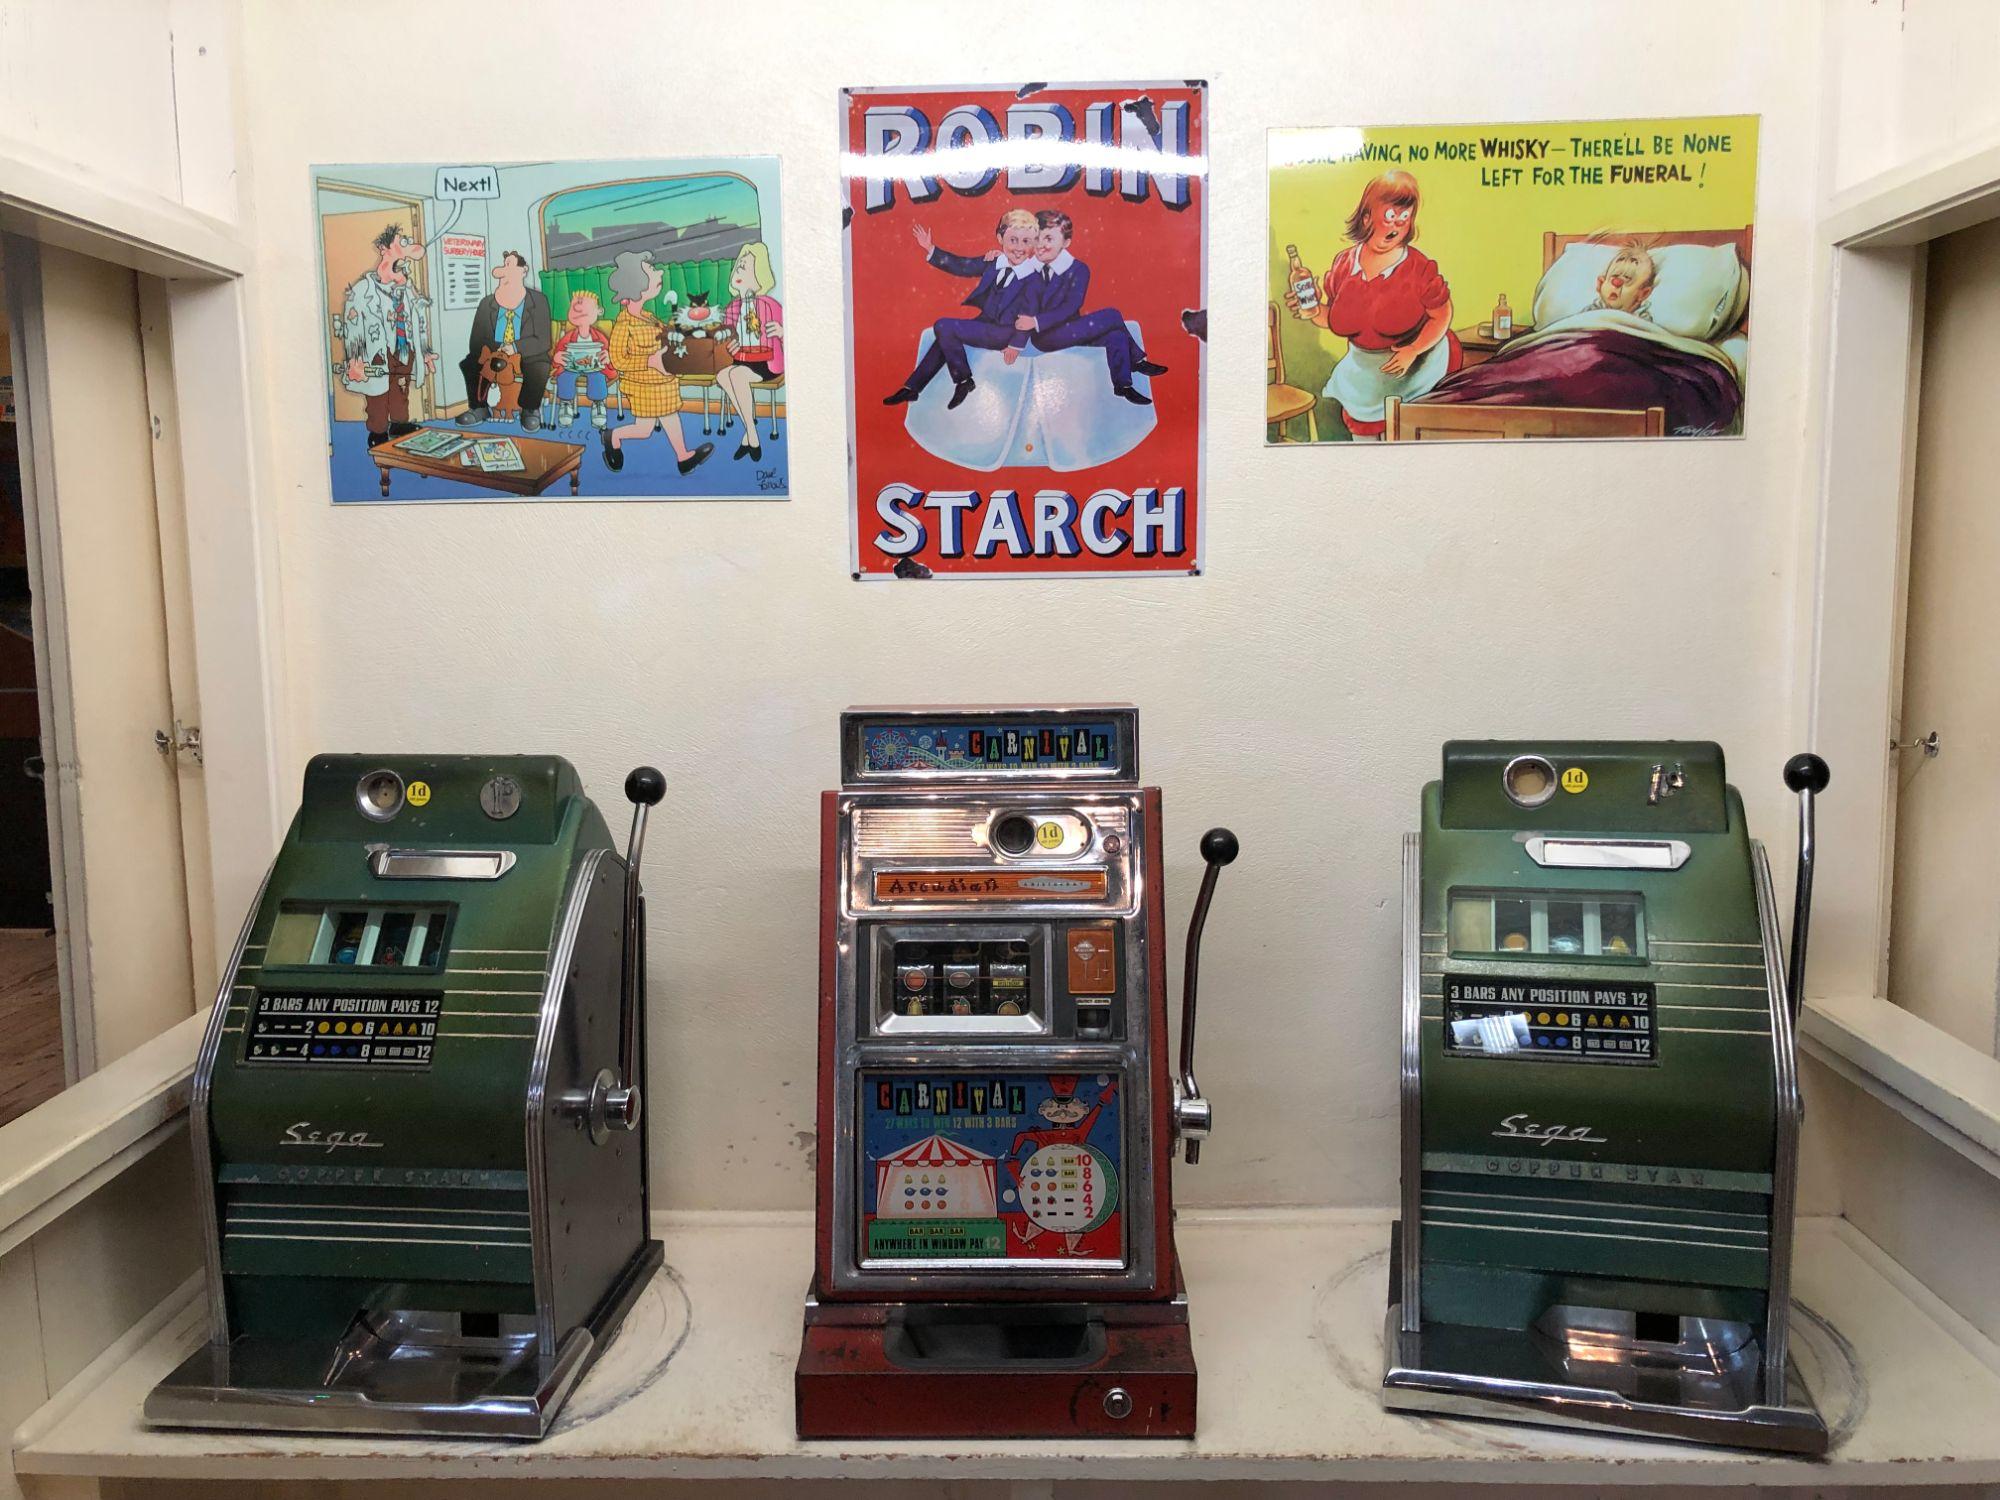 Free stock photo gambling slot machines